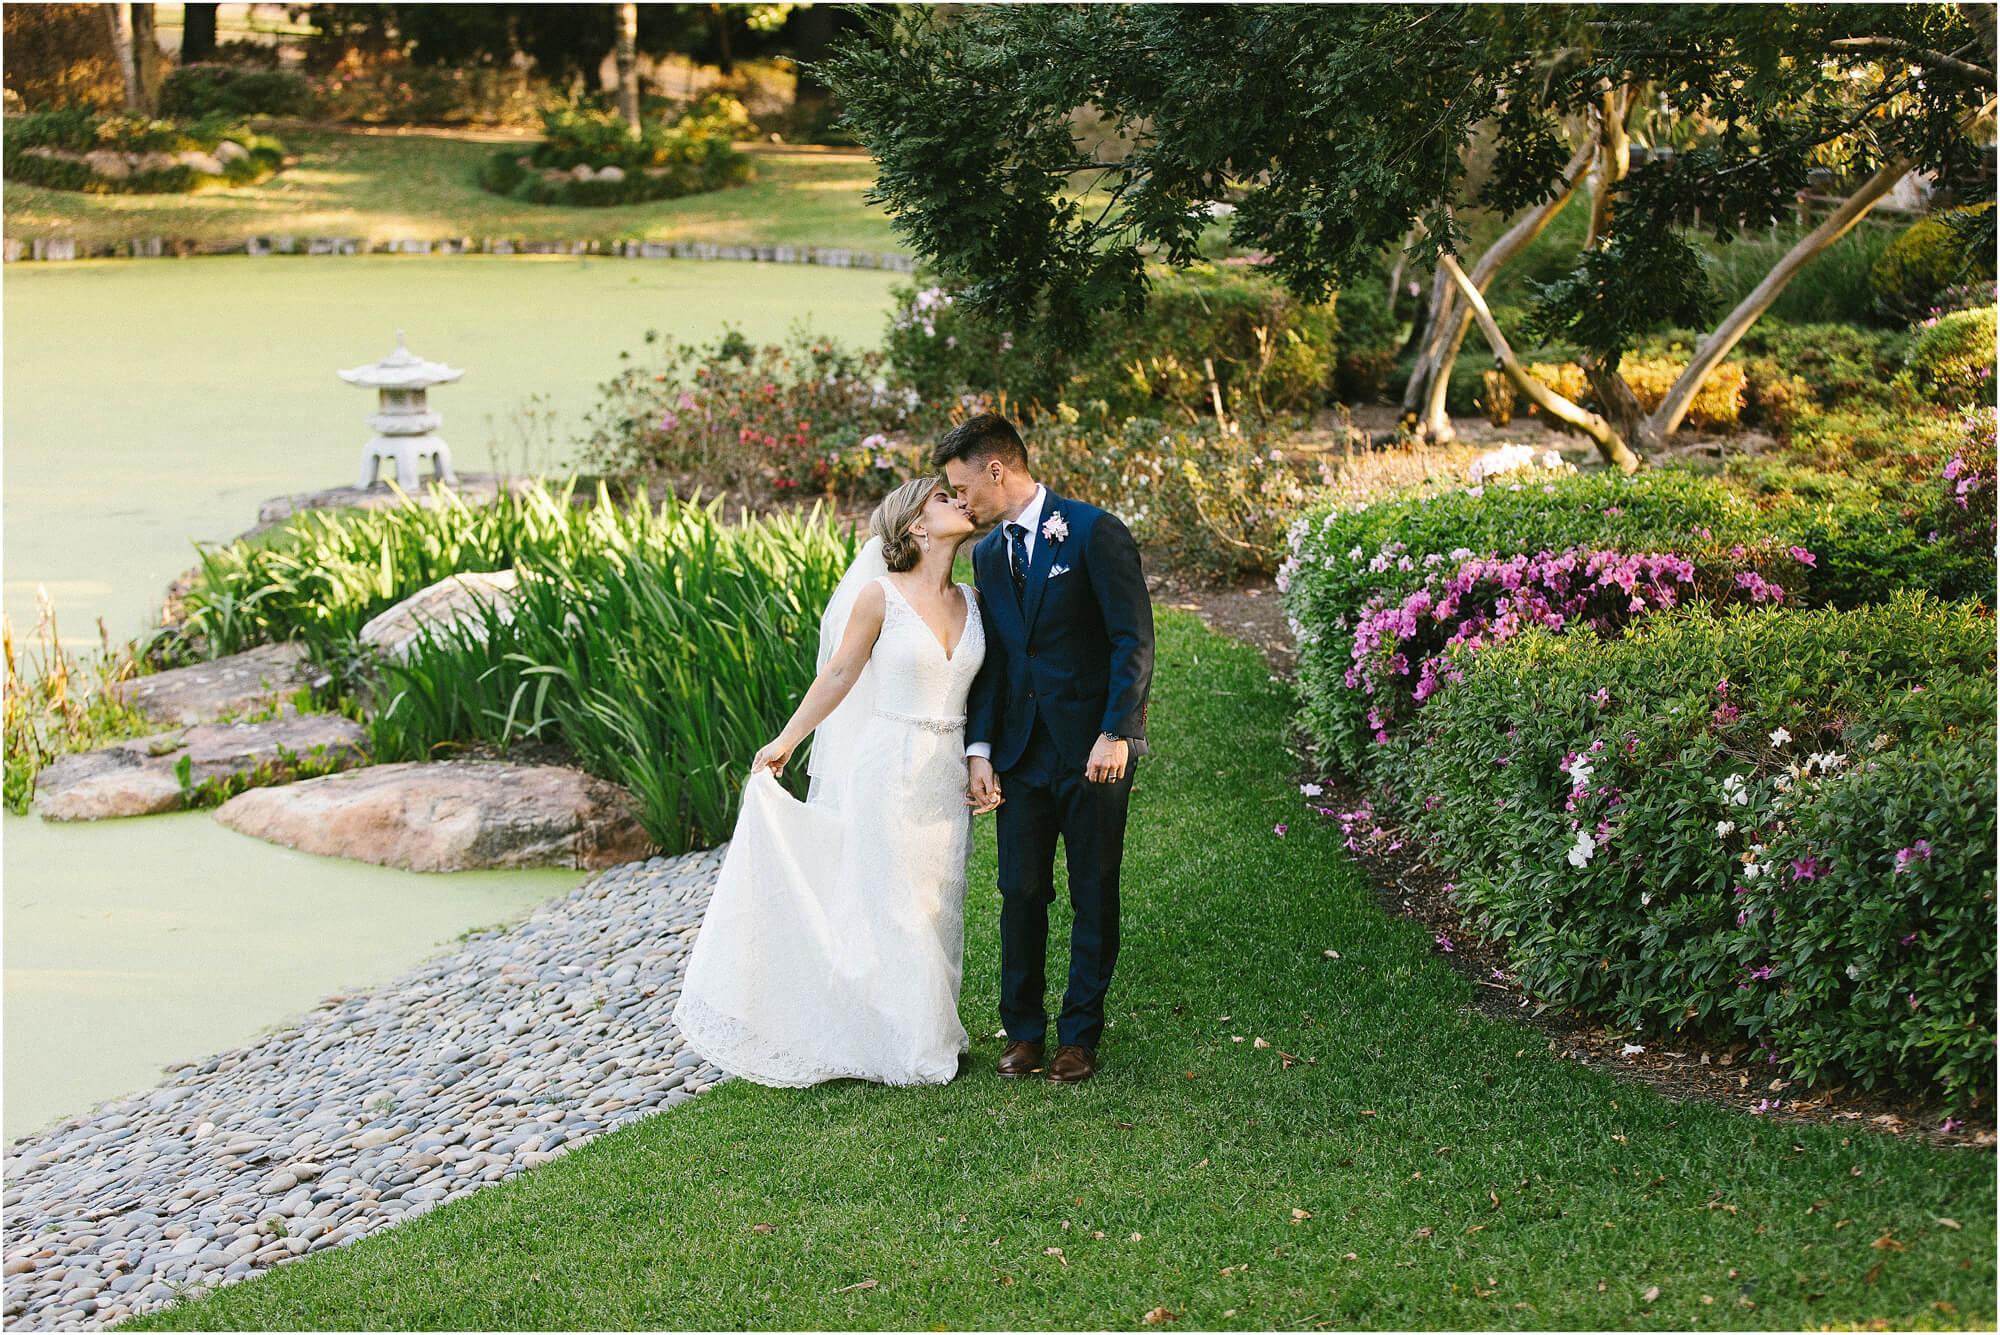 Wedding at Nerima gardens